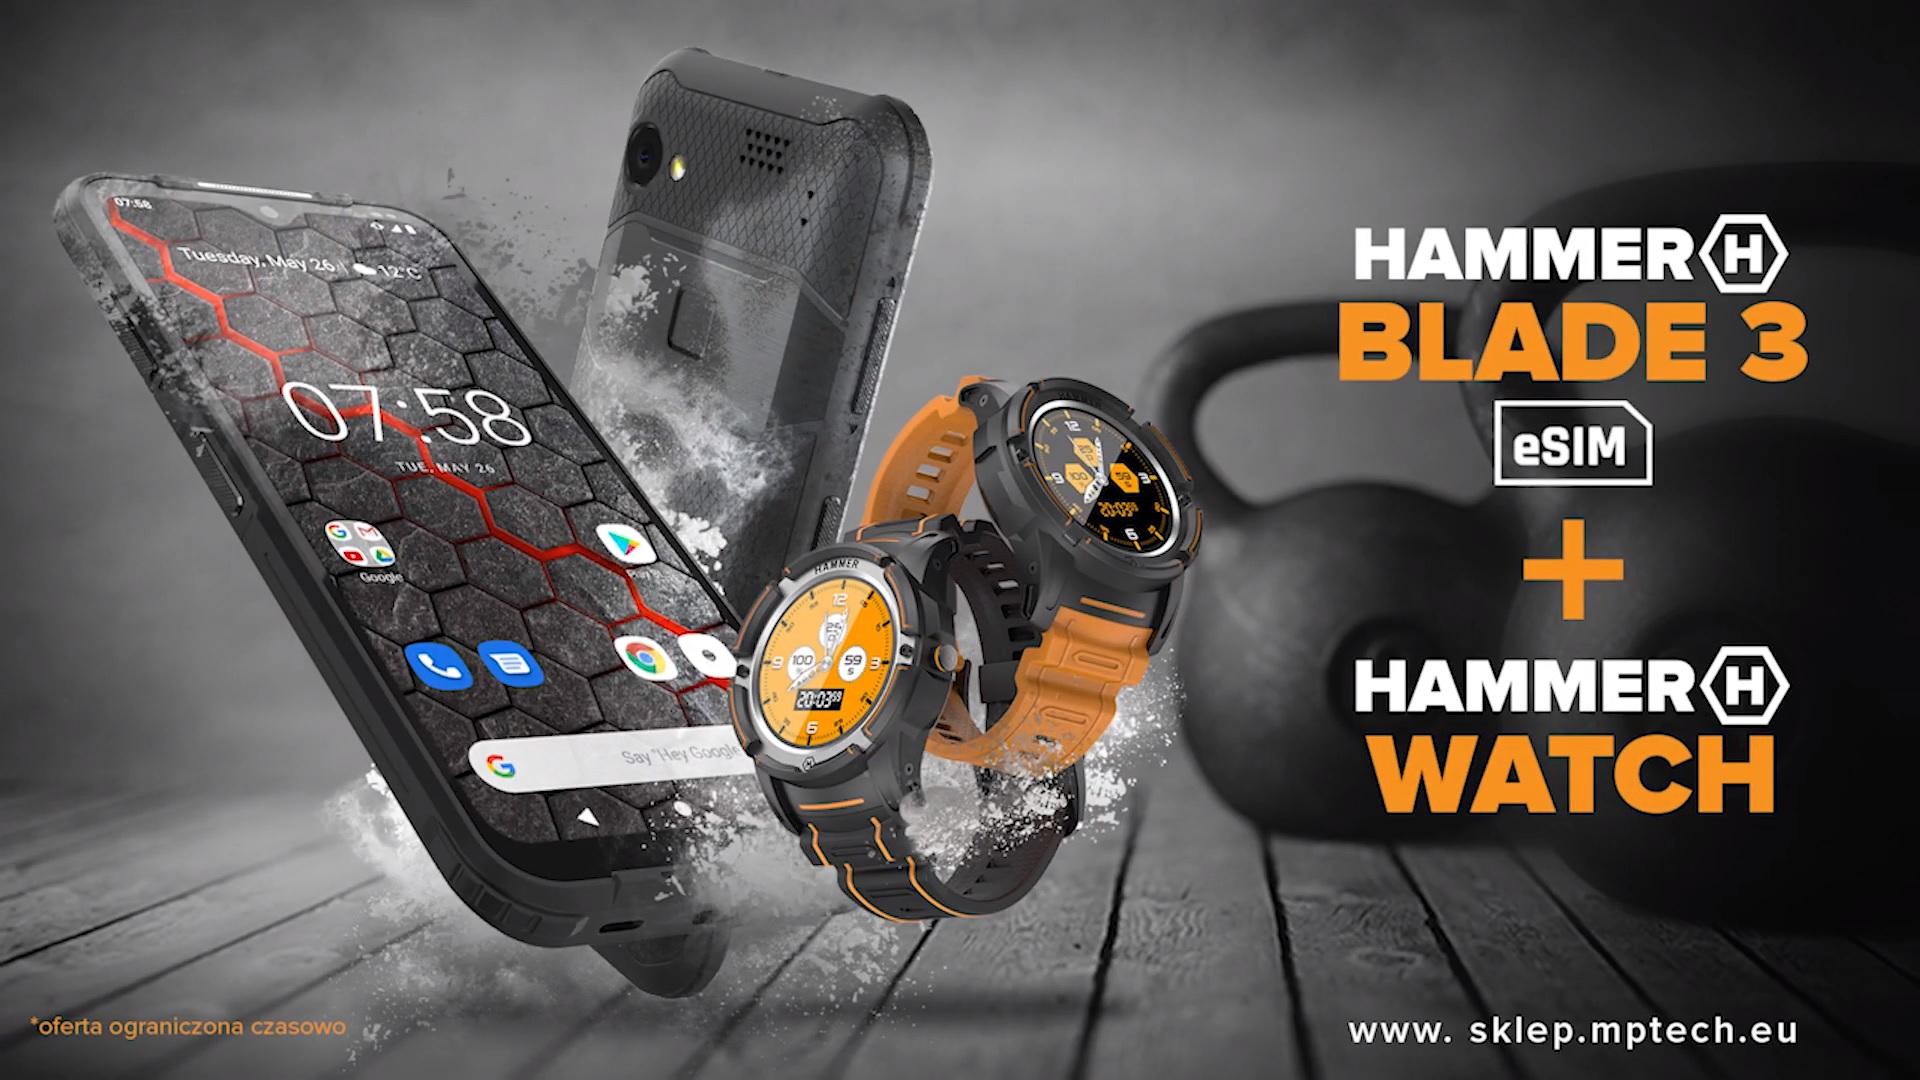 smartfon HAMMER Blade 3 HAMMER Watch